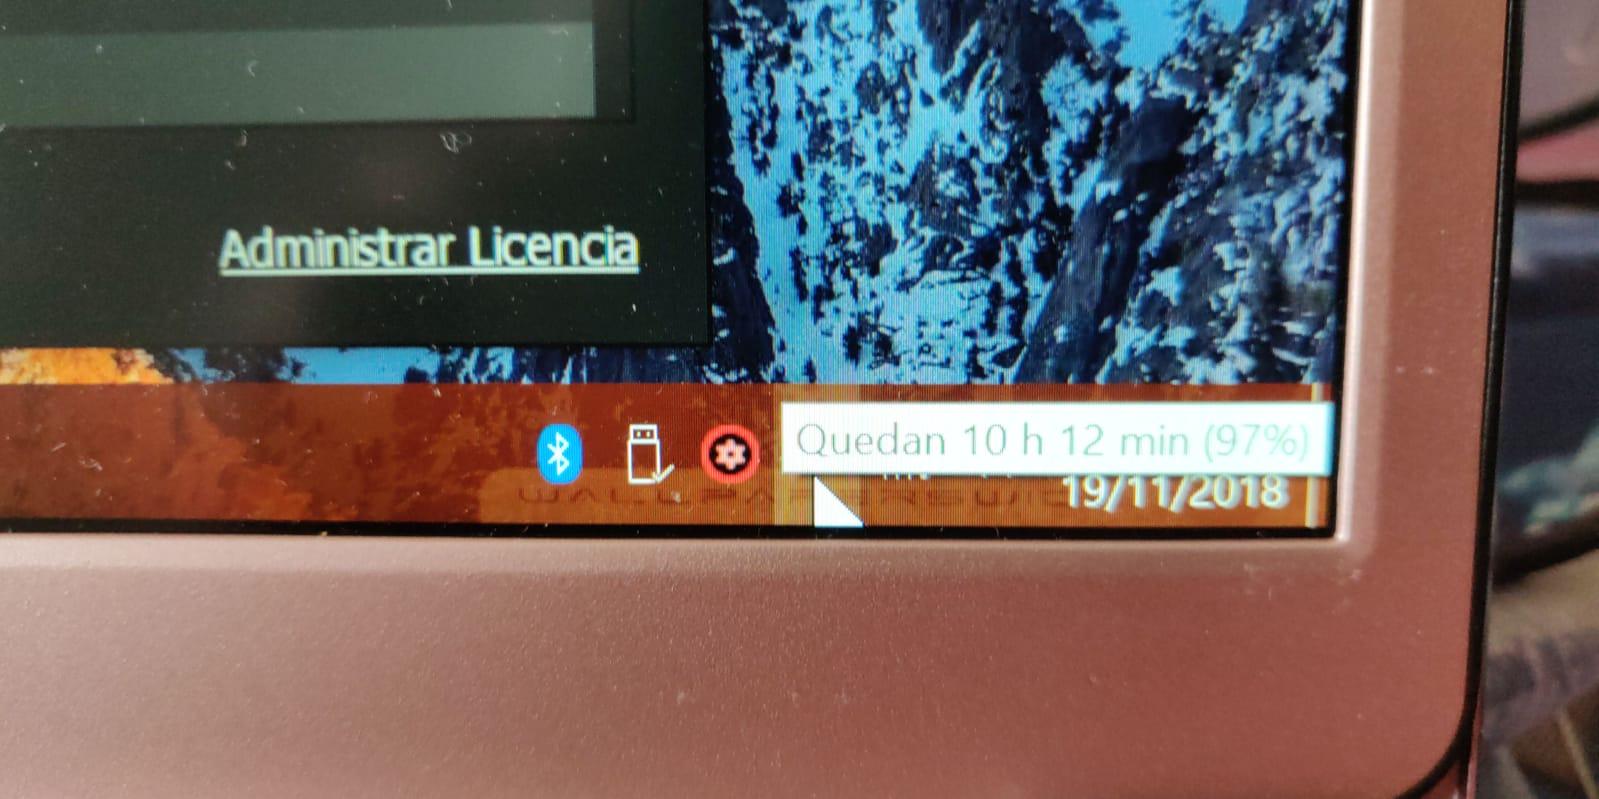 Windows 10 Lightning - aumentar bateria windows gratis